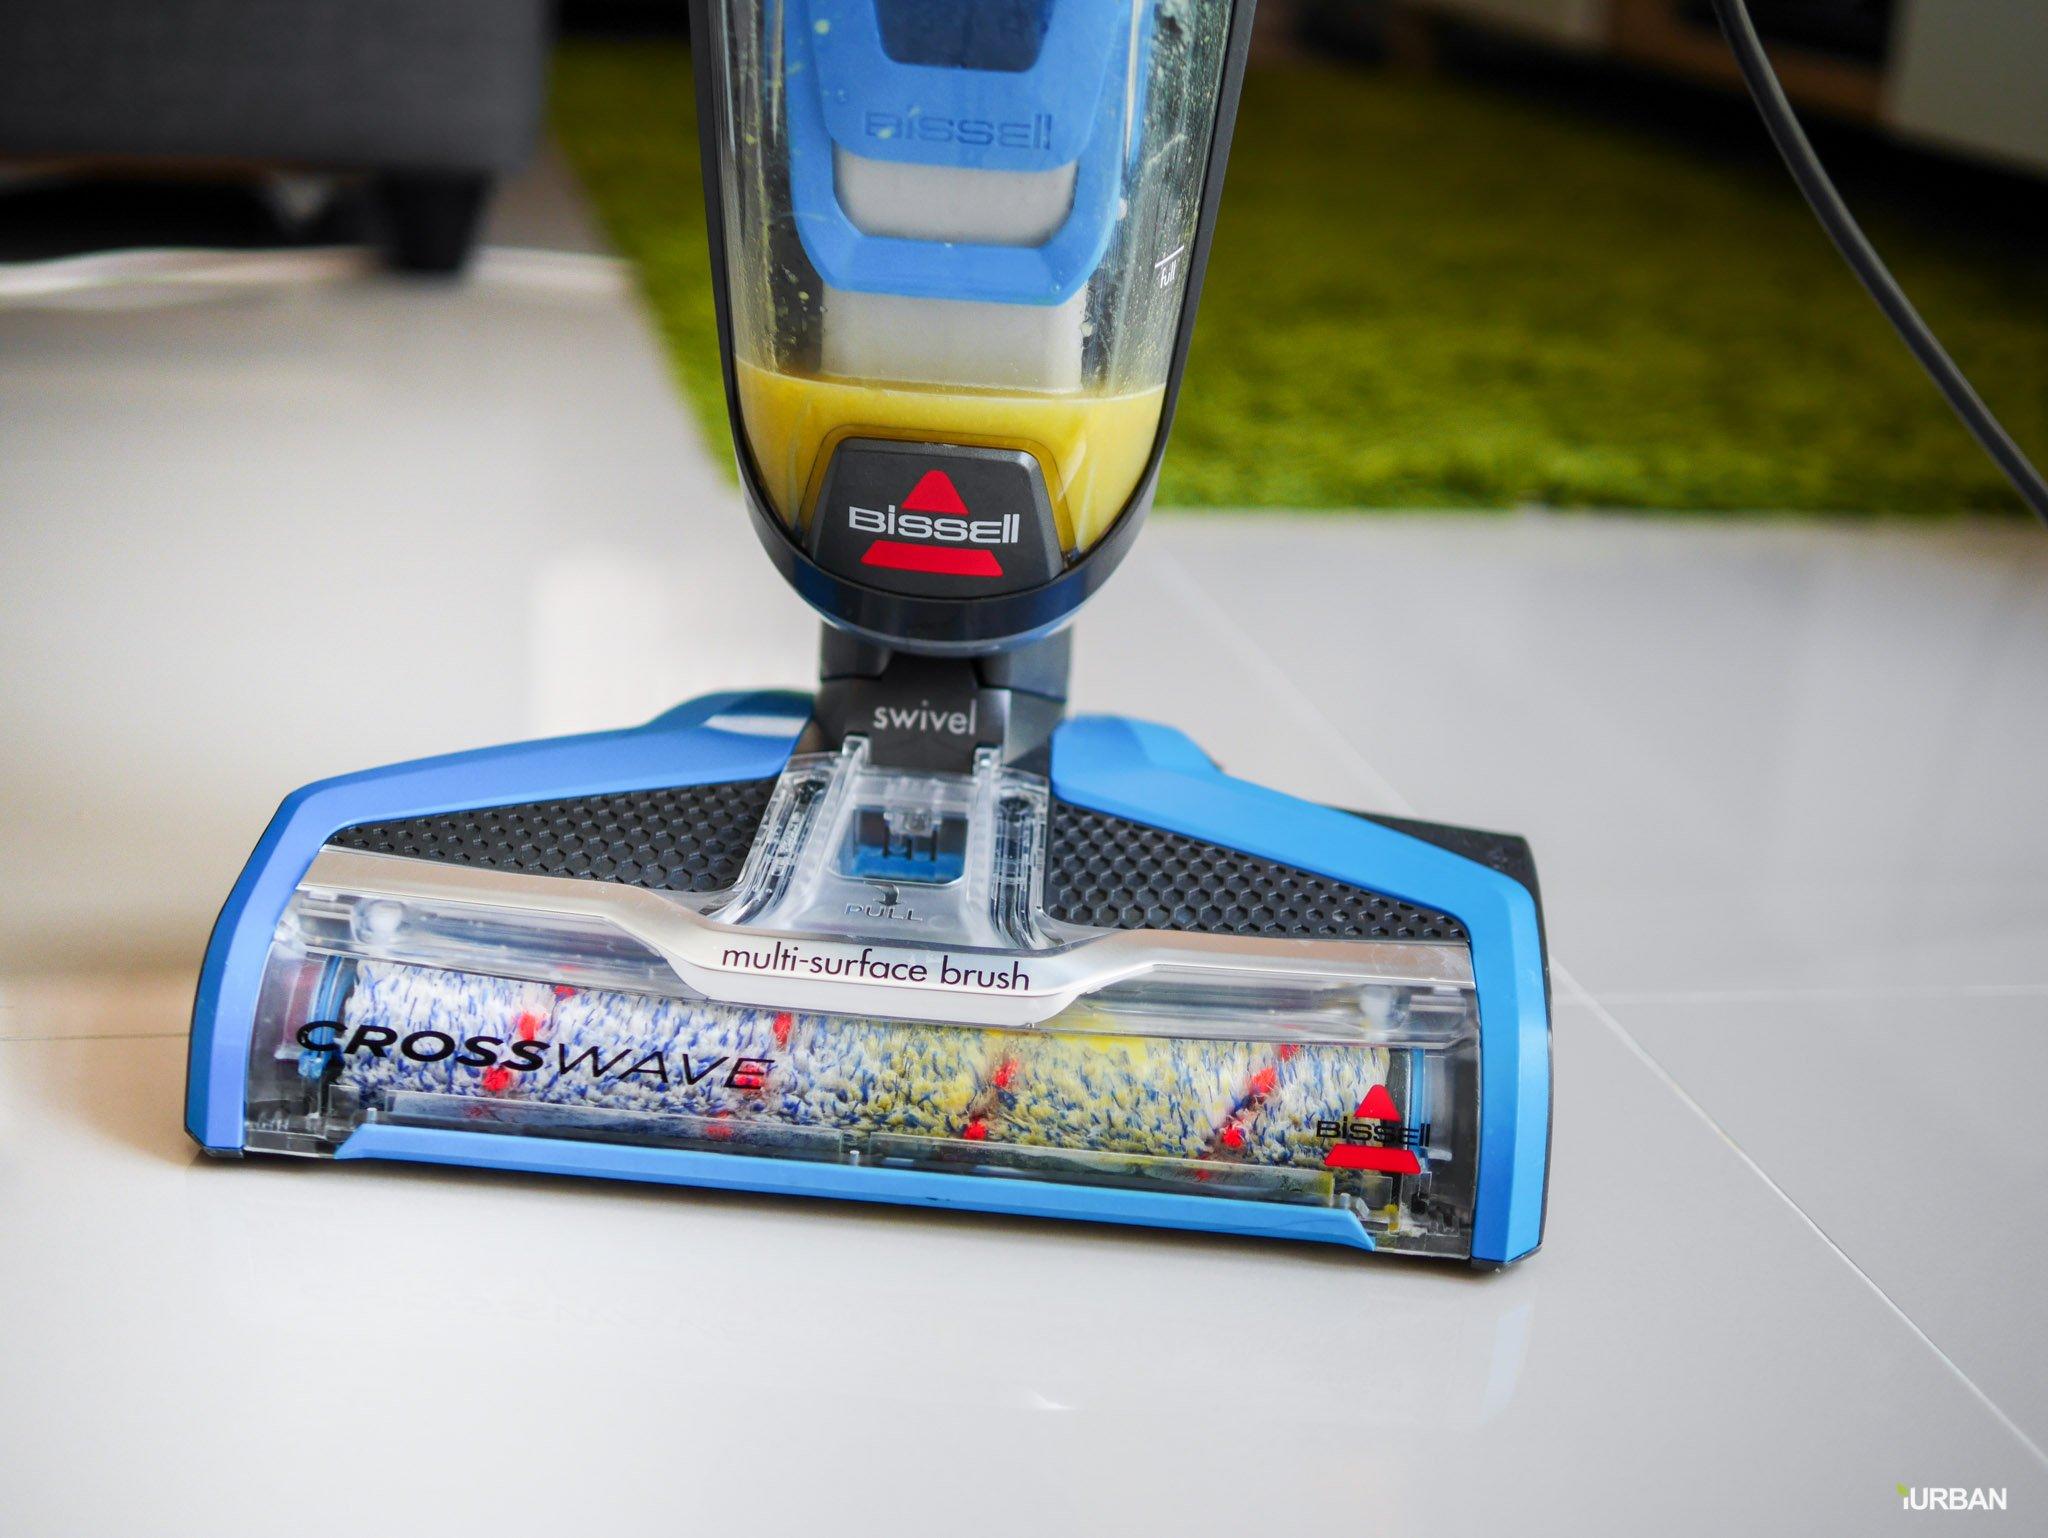 "Bissell Crosswave รีวิวนวัตกรรมเครื่องทำความสะอาด 3-in-1 ดูดเปียก-ล้าง-ถูแห้ง ""ในครั้งเดียว"" 19 - Bissell"